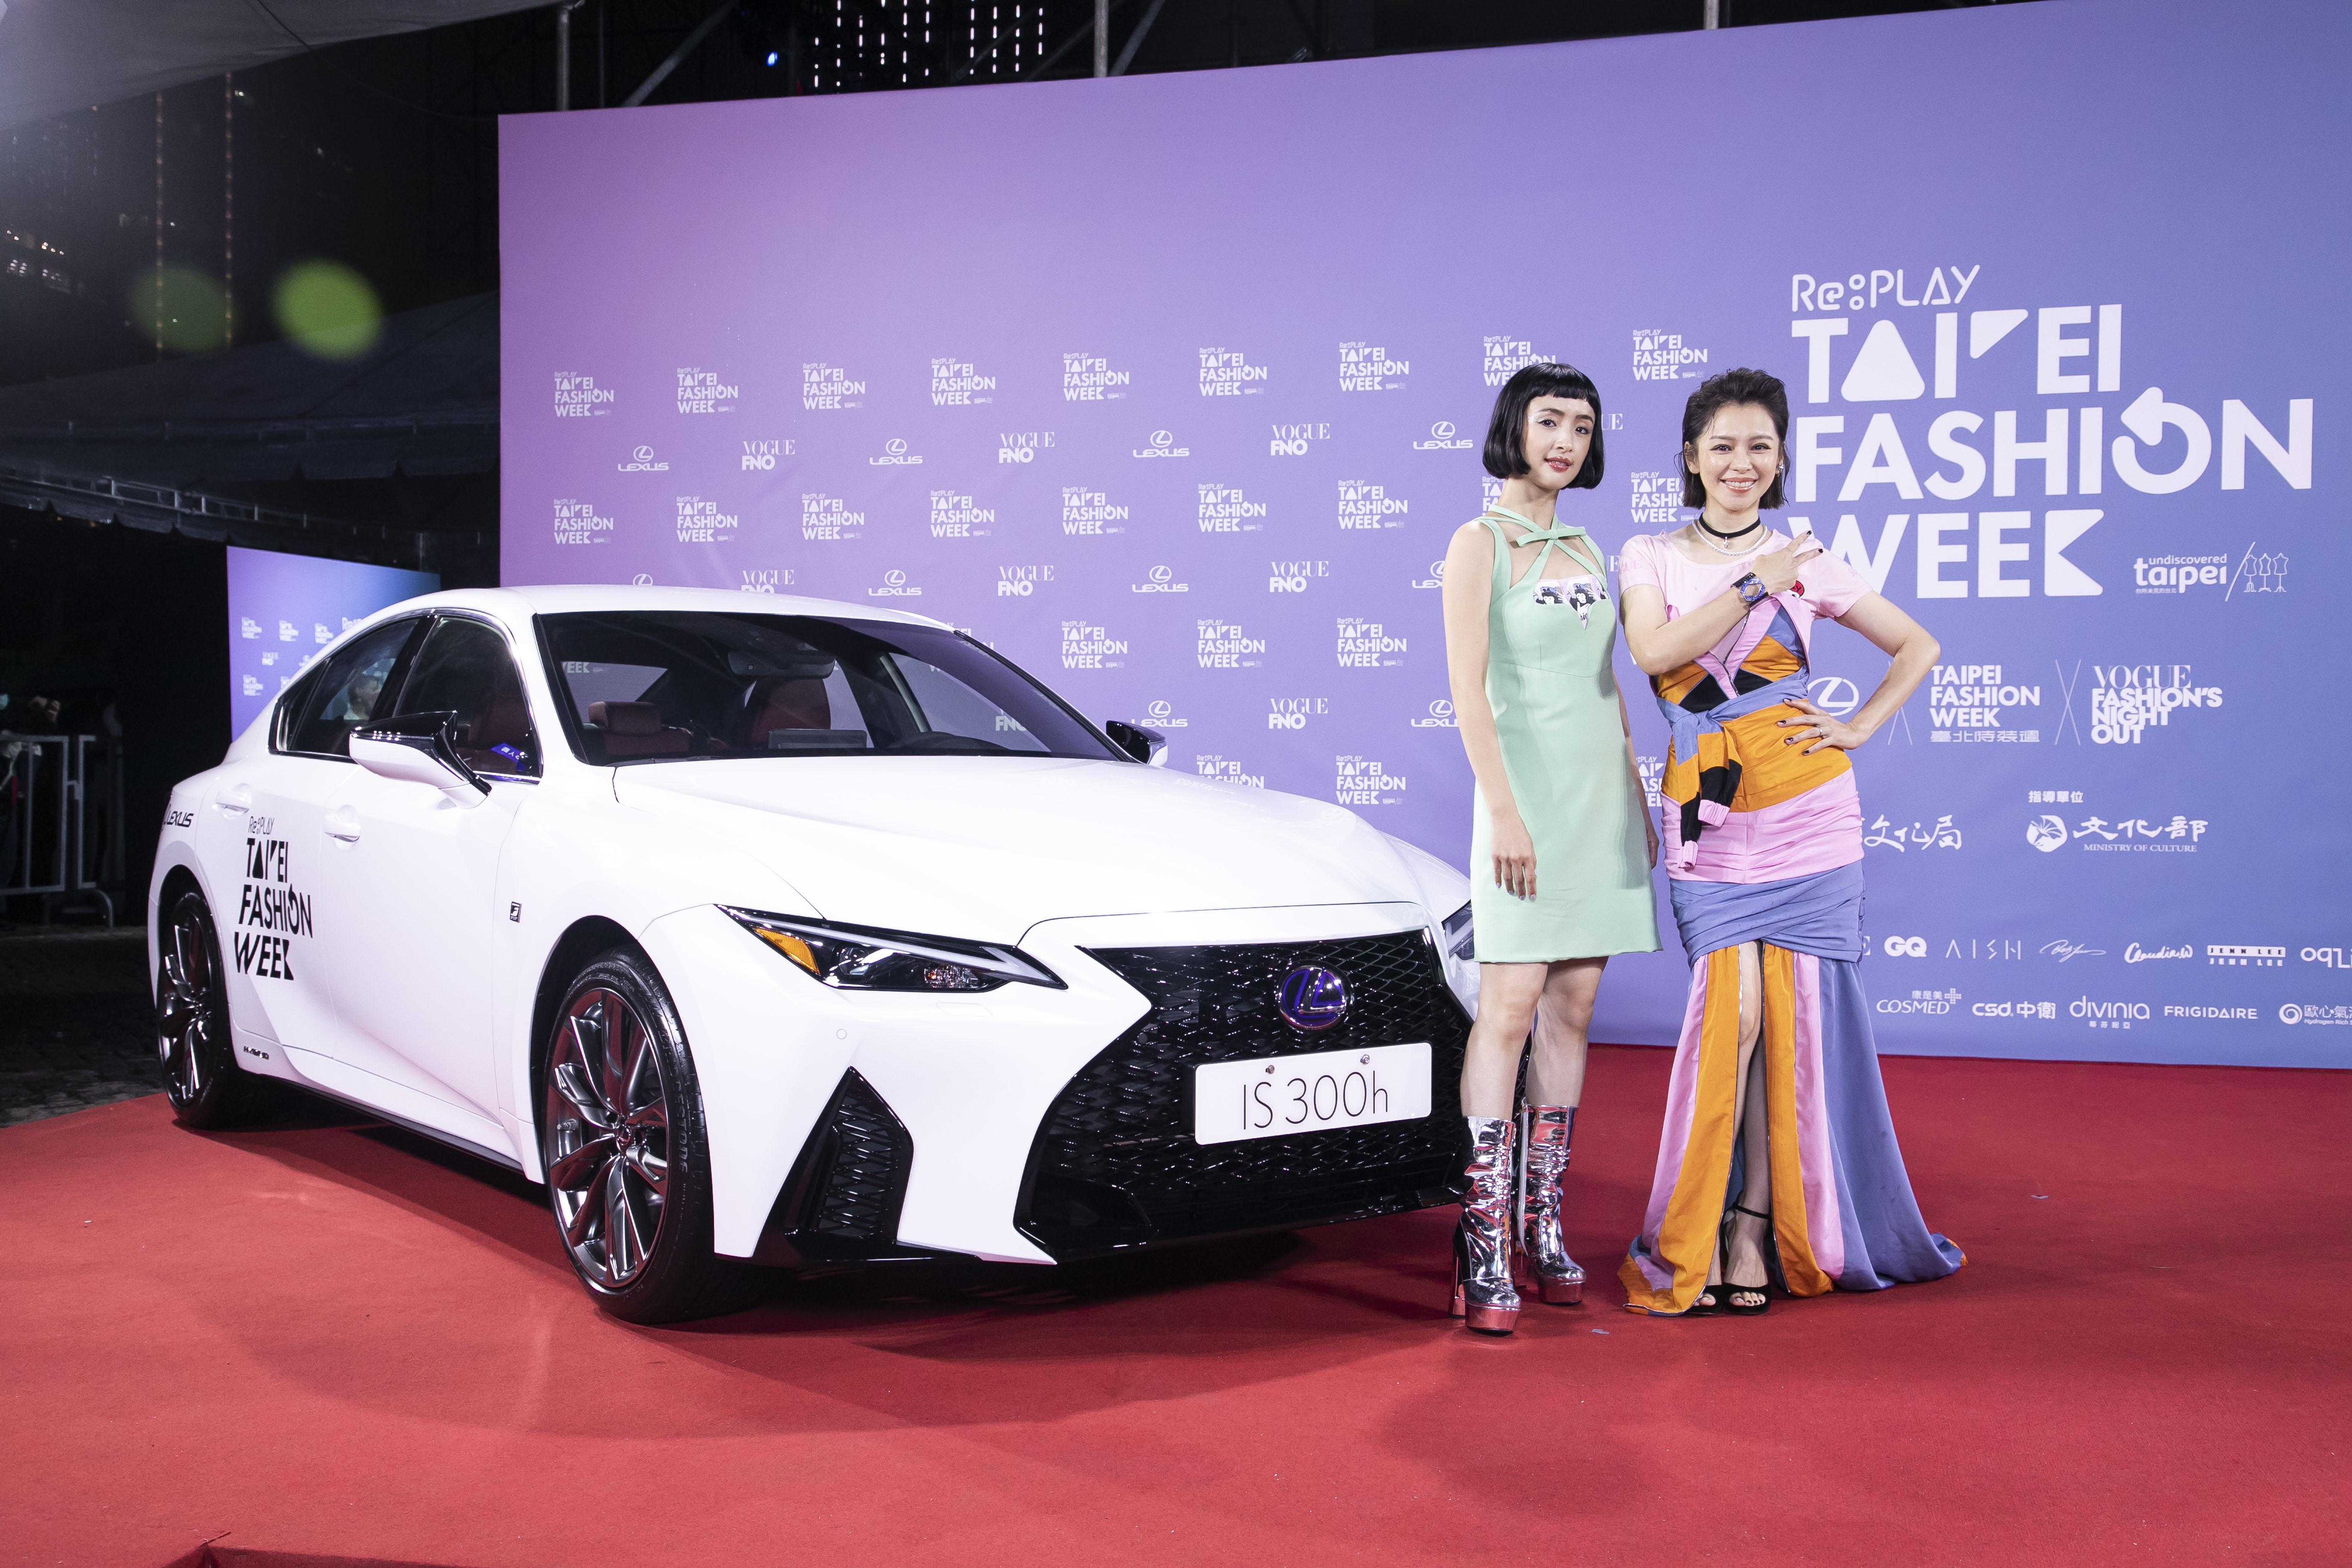 Lexus 2 - giles.heasman(何家樂) - Taiwan - Taipei Fashion Week x Vogue FNO - Sponsor 1